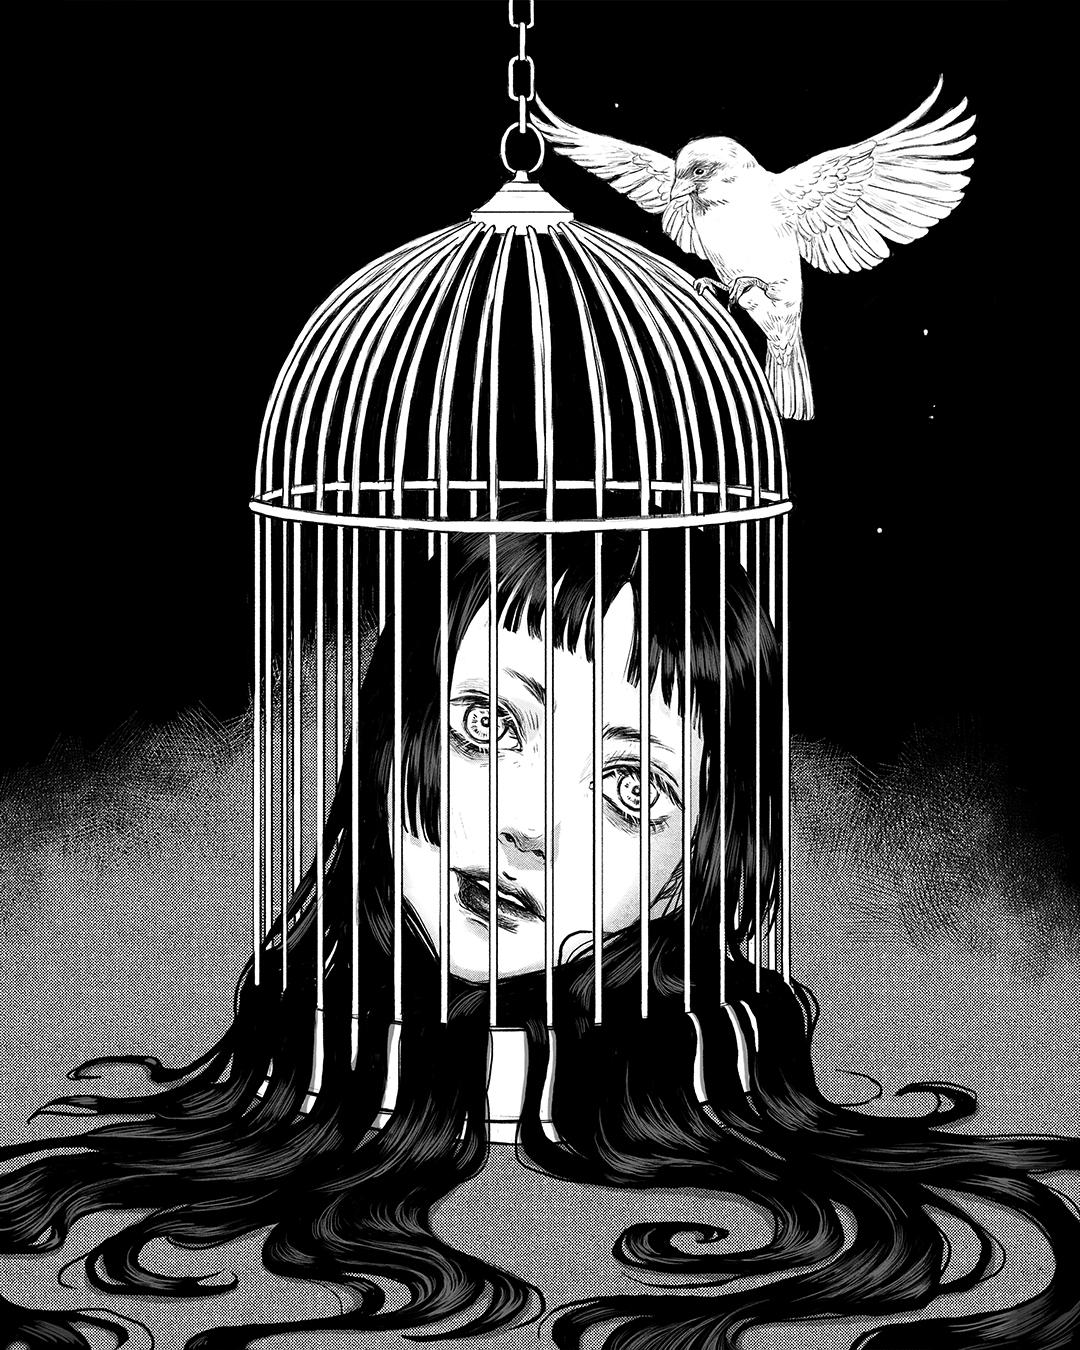 GirlsclubAsia-Illustrator-Anwita Citriya-2